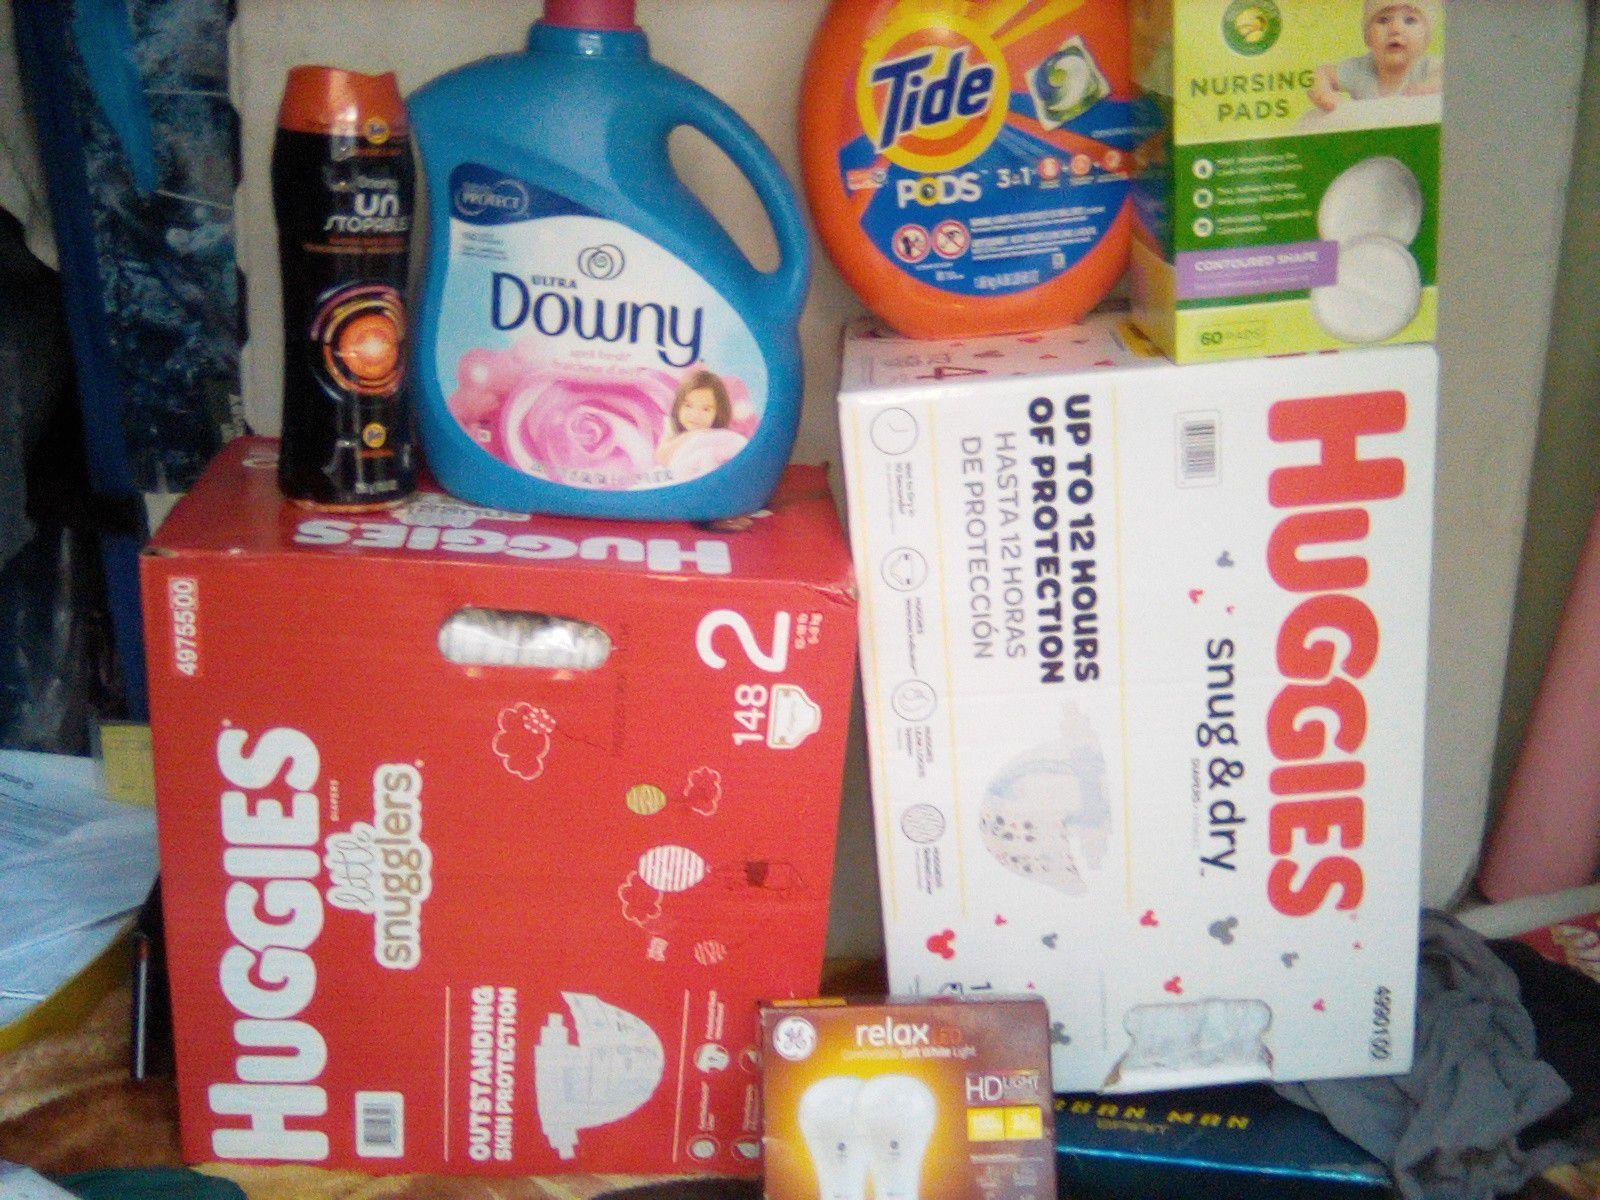 Huggies + Tide pods +Downey bundle !!!$ave$$!!